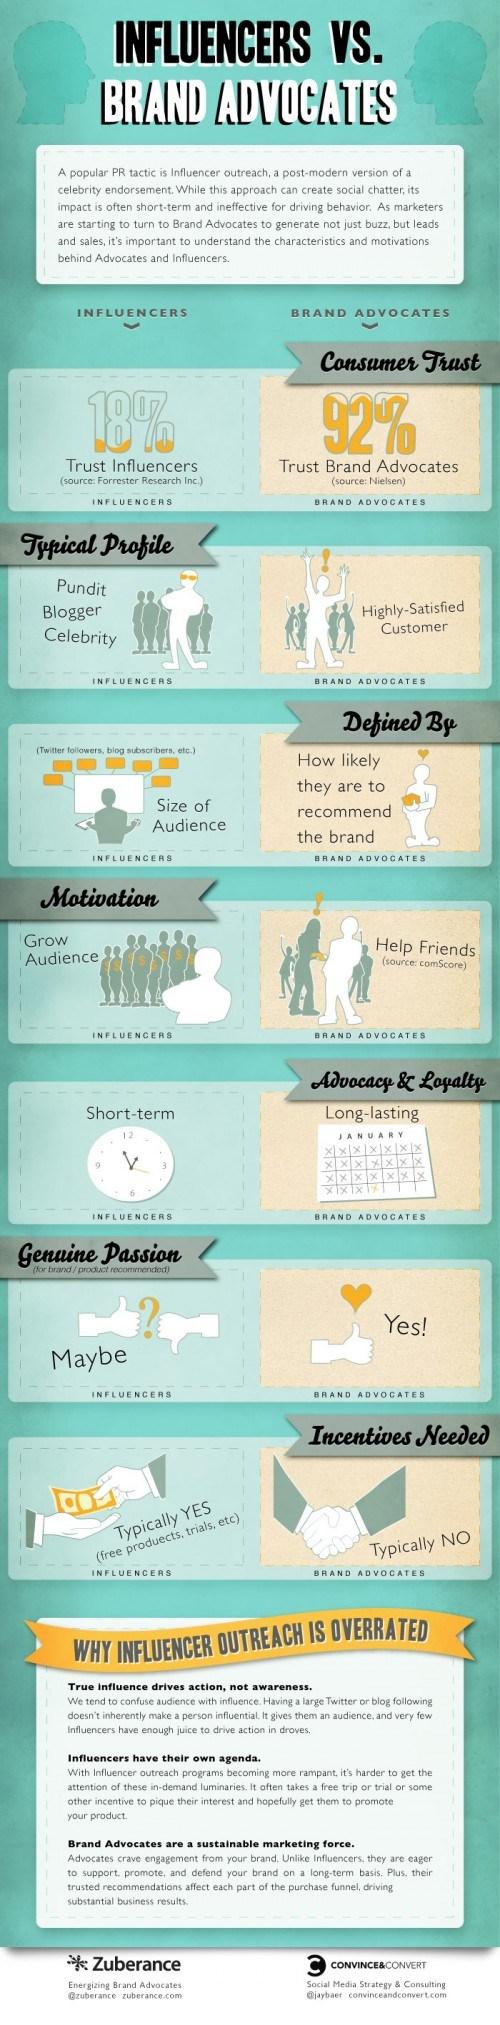 Médias sociaux influenceurs et ambassadeurs